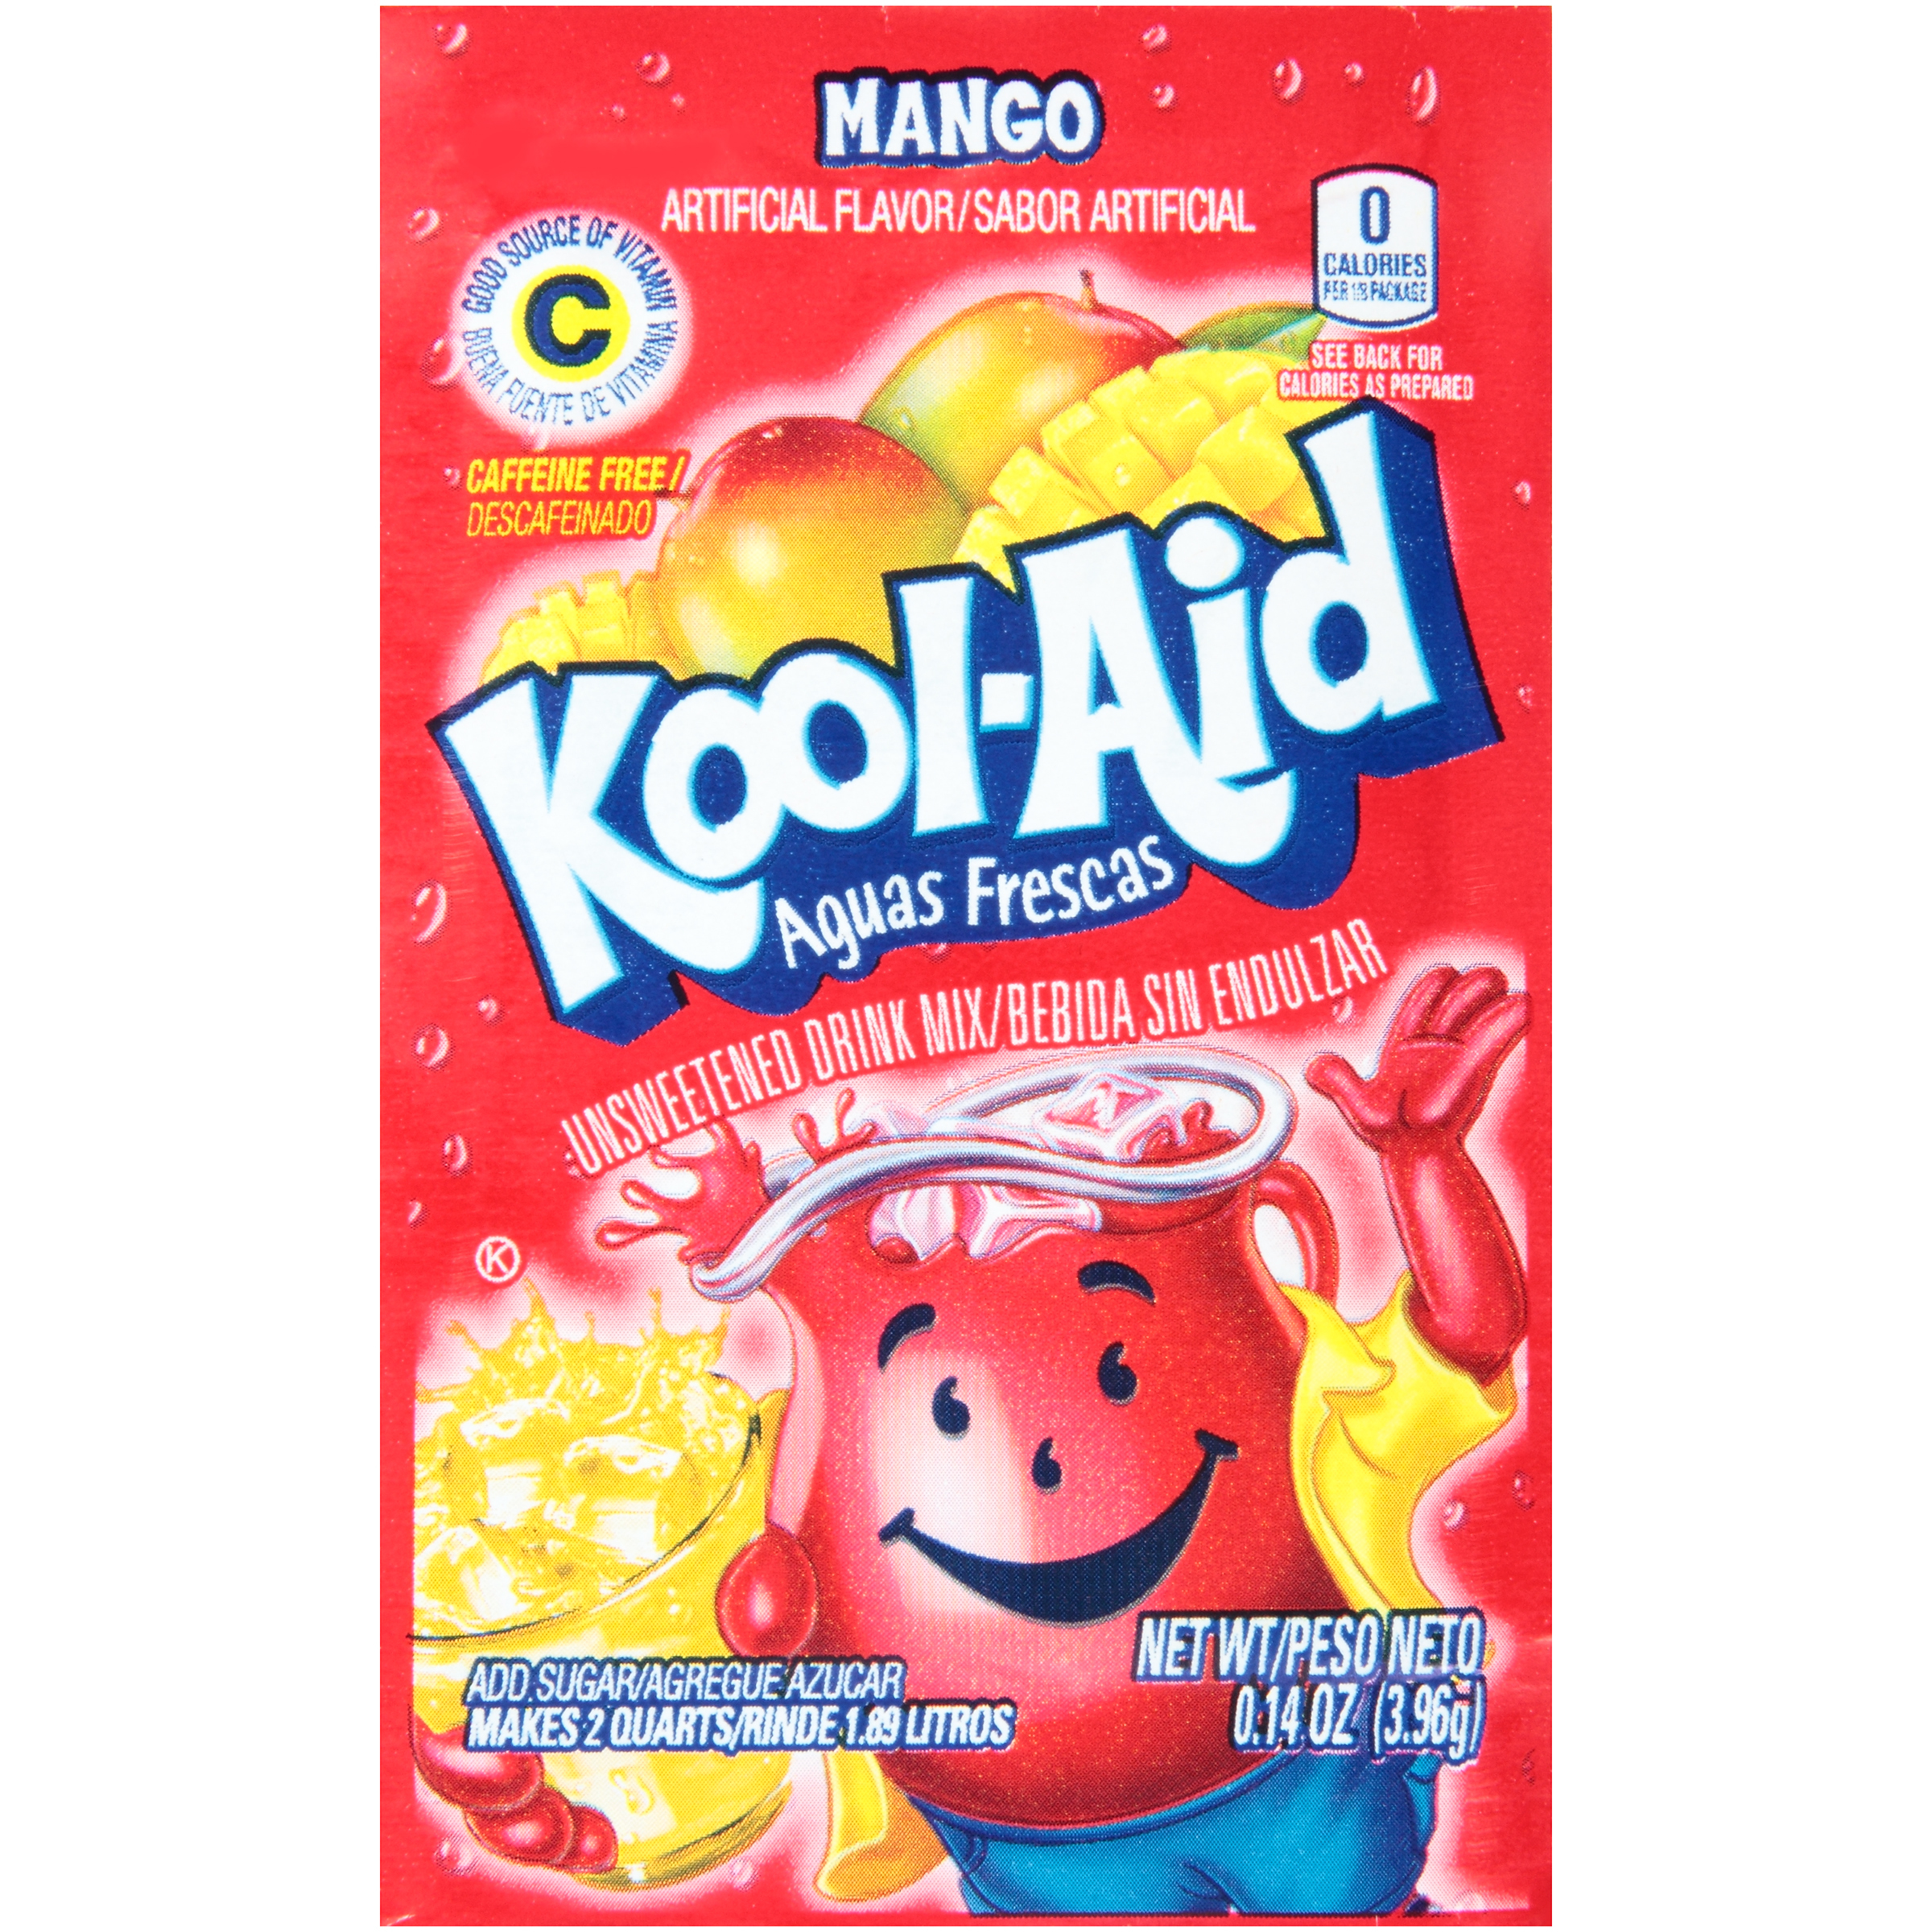 KOOL-AID Aguas Frescas Mango Drink Mix Unsweetened  0.14 oz Packet image